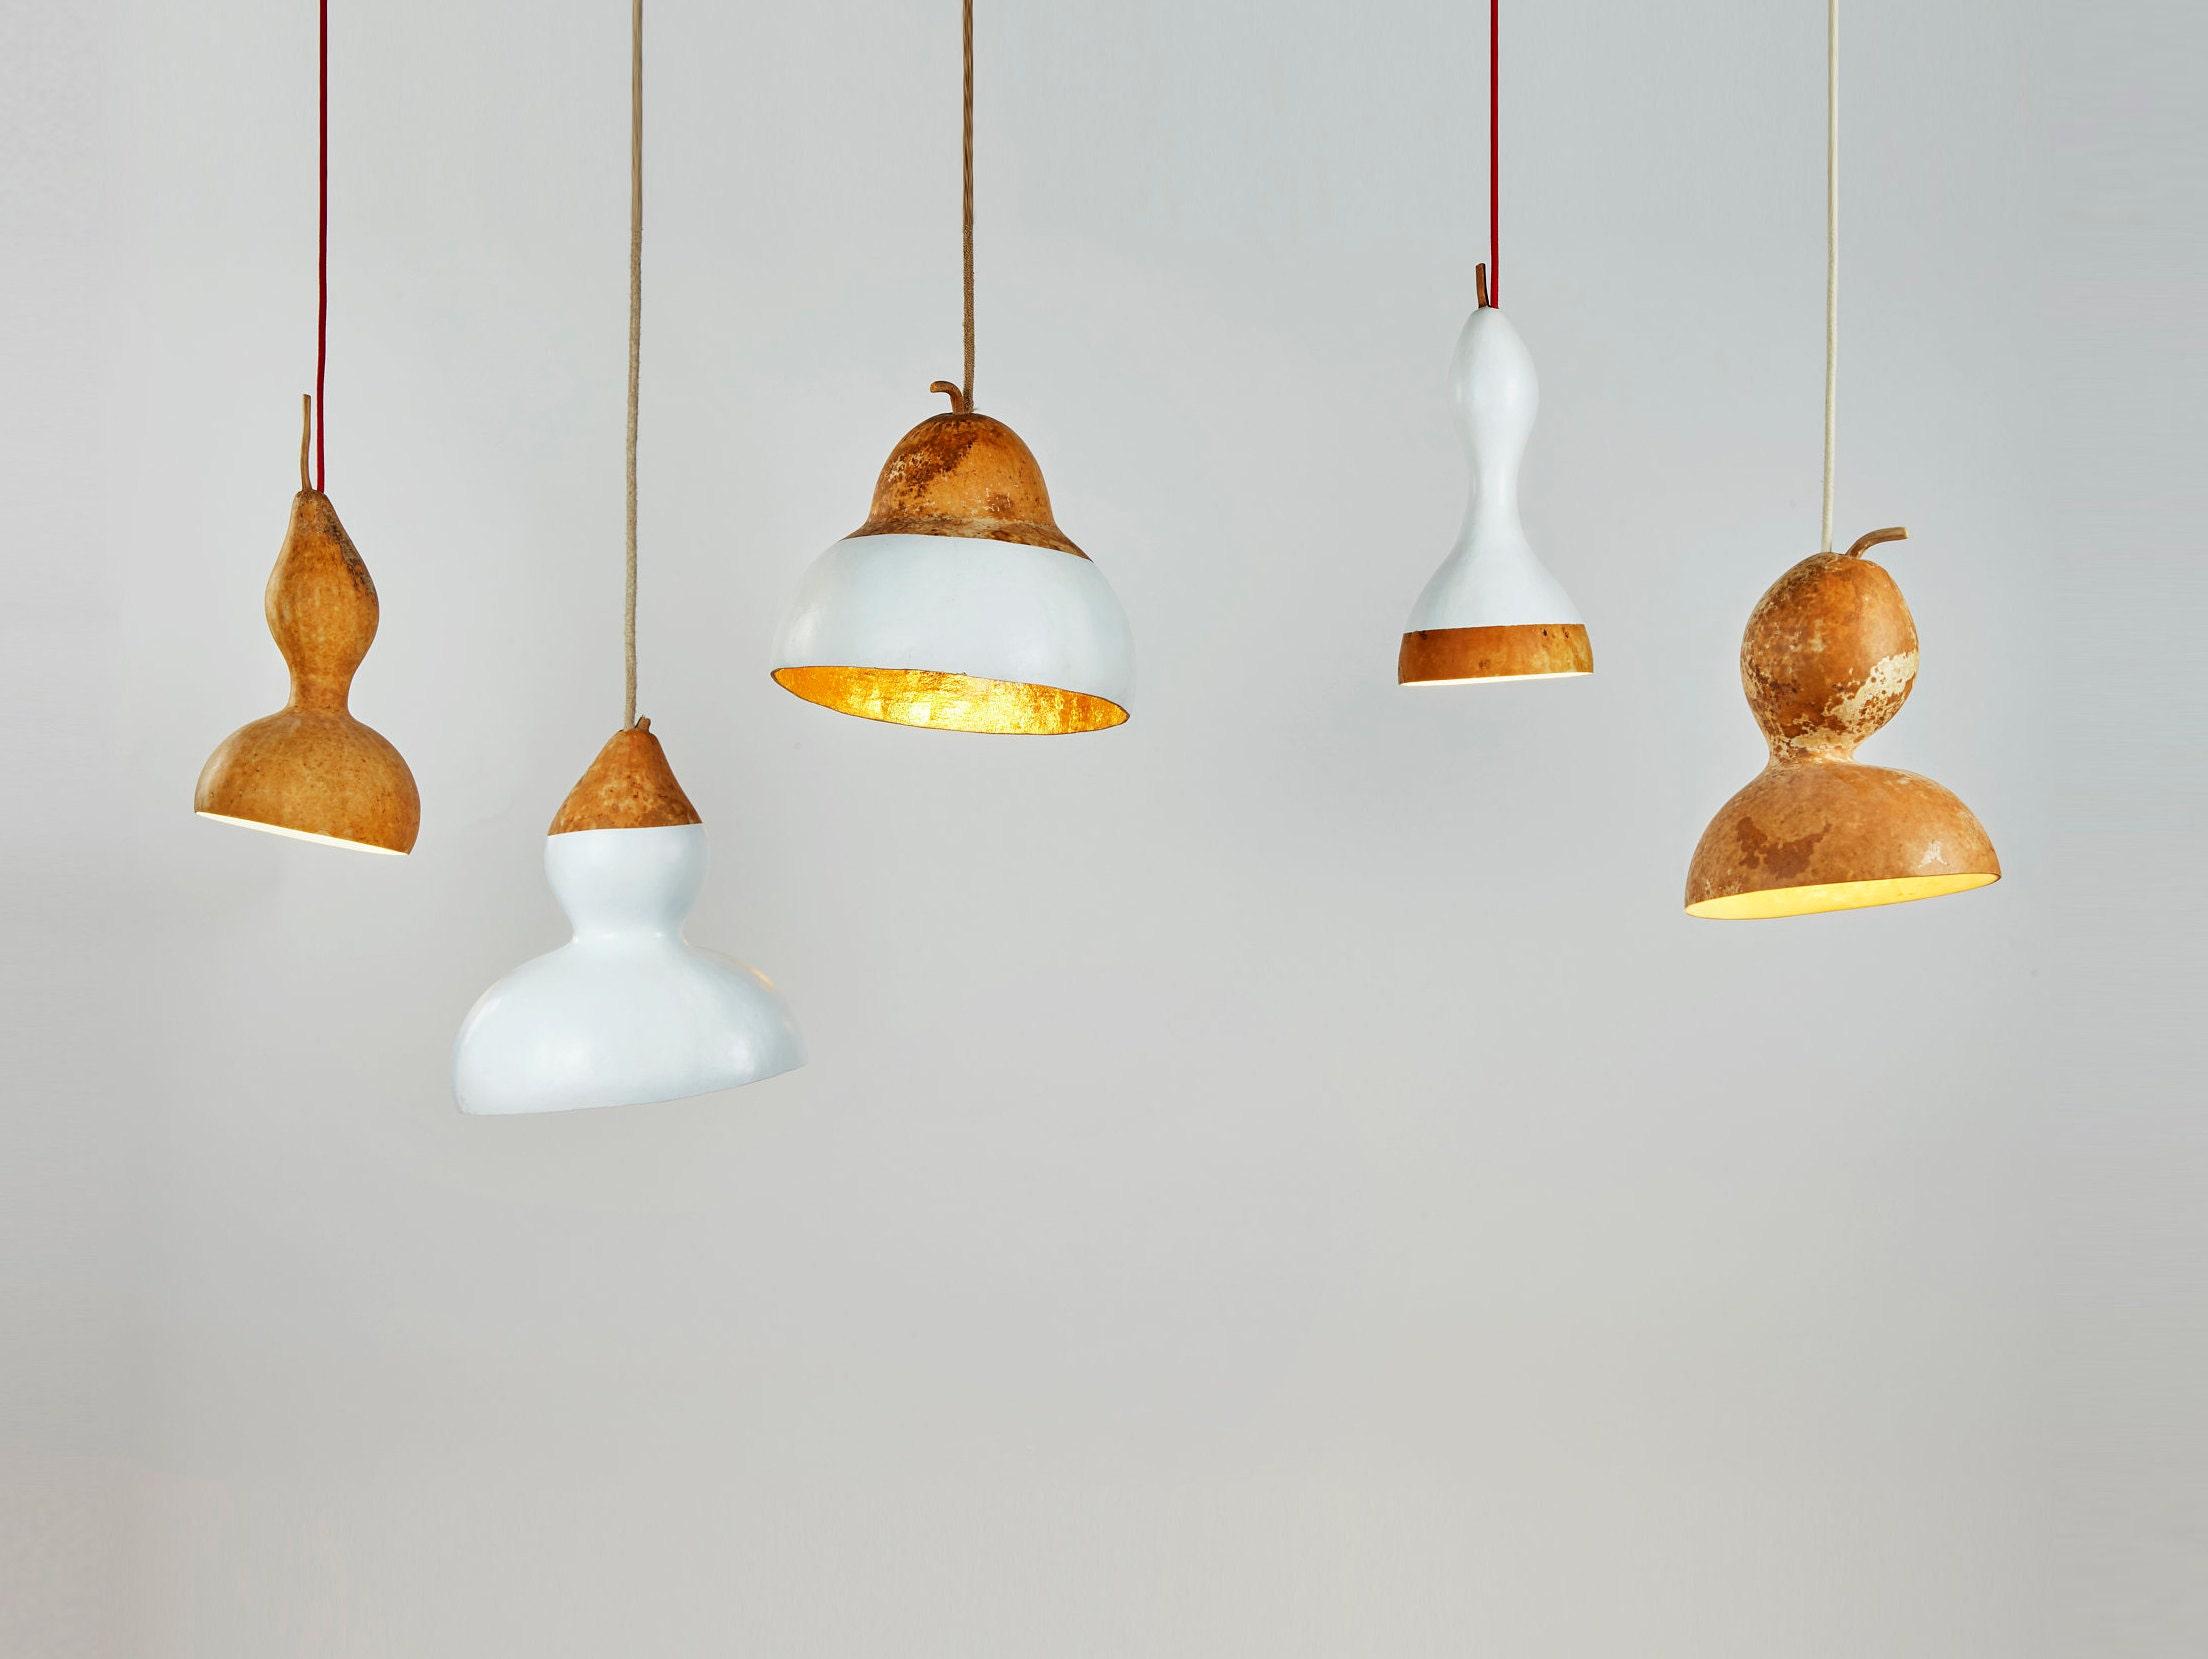 Wood pendant light hanging lamp steampunk lamp ceiling fixture modern table lamp ceiling light light fixture gourd bedside lamp